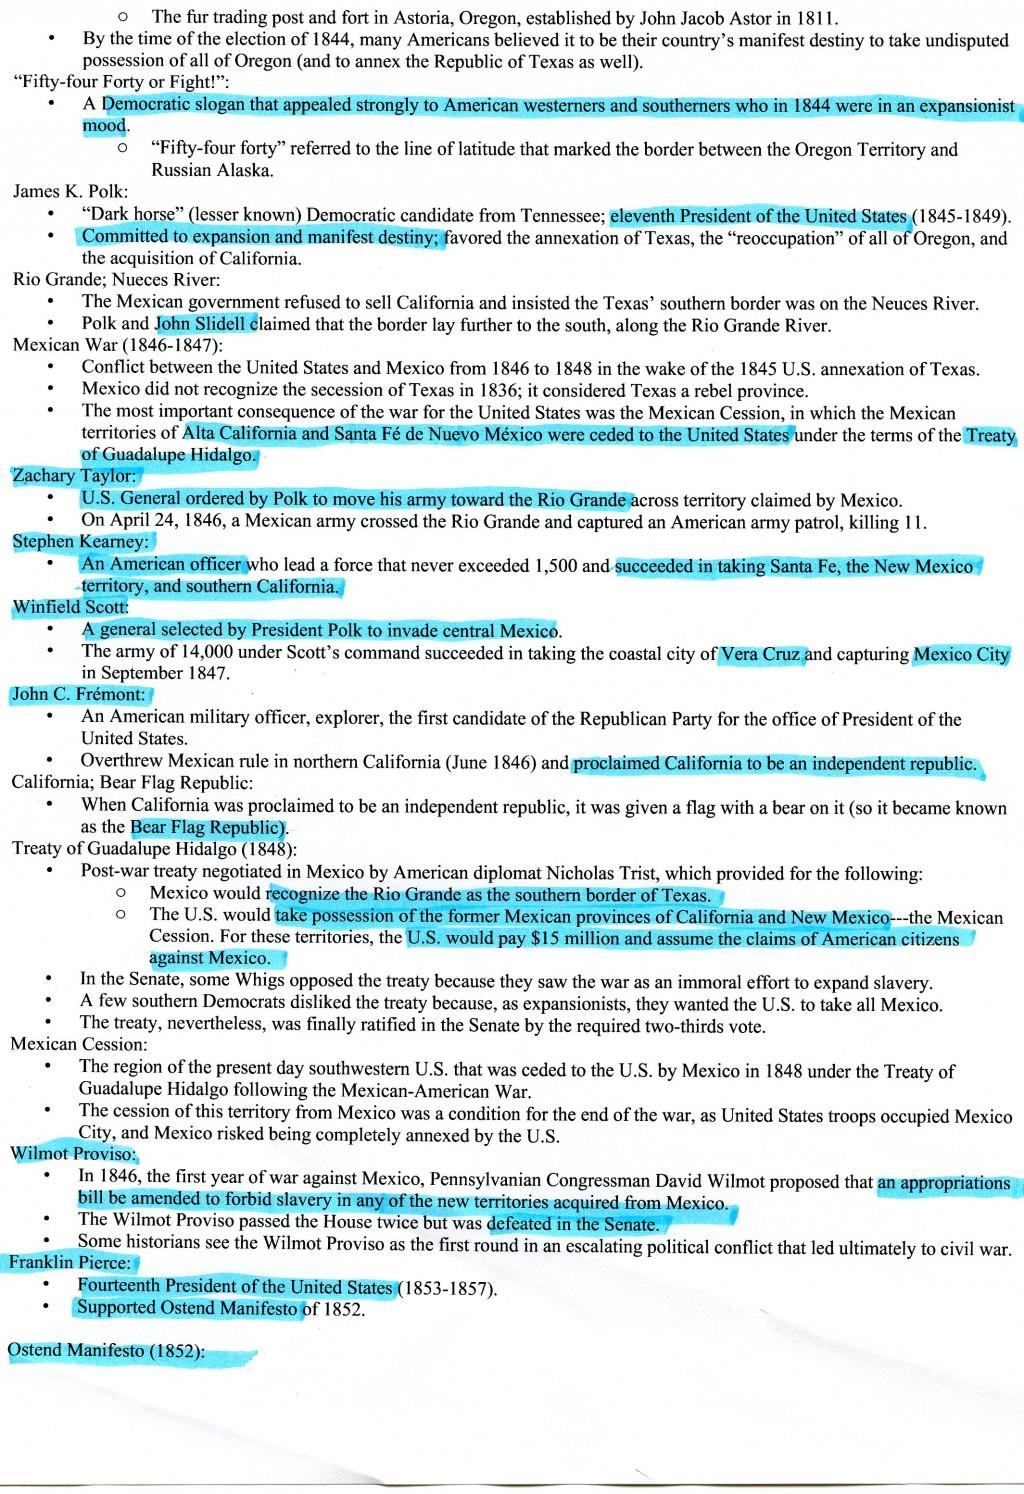 008 Essay Example Manifest Destiny Apush Essays Free Titles On Questions About Megaessays Com Prompt Conclusion Hook Outline Pro Over Impressive Introduction Large